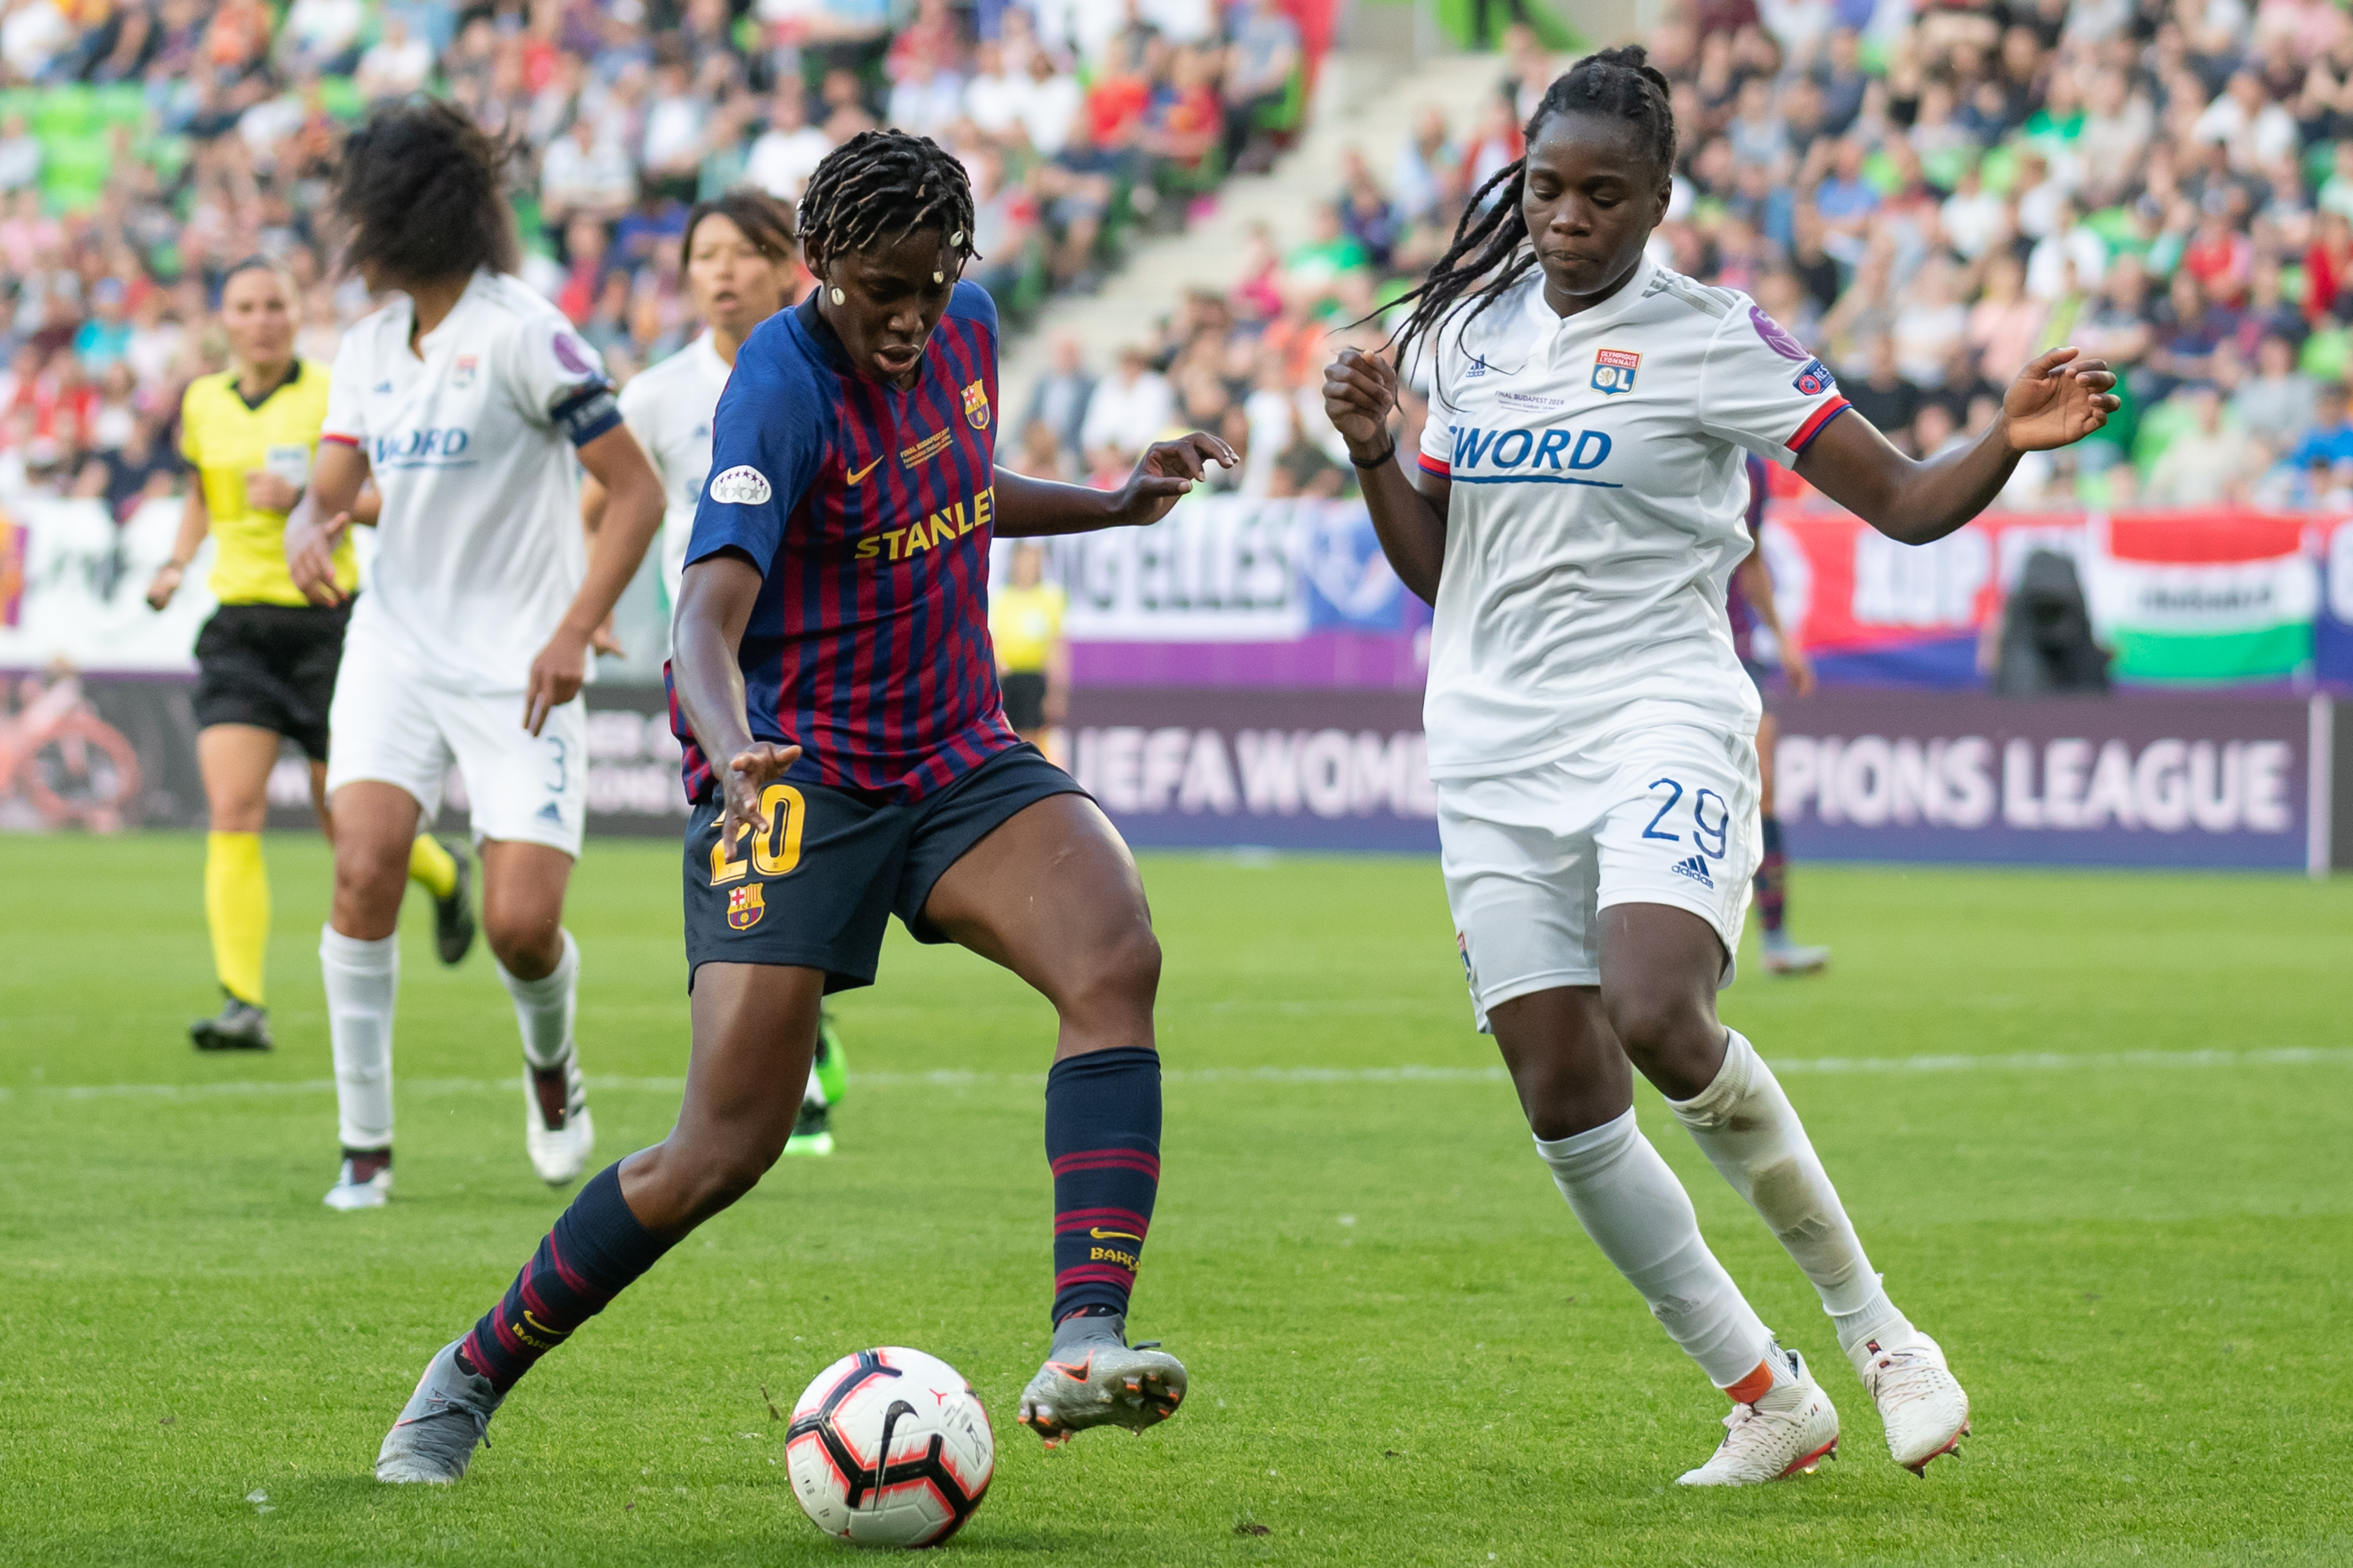 File 2019 05 18 Fussball Frauen Uefa Women S Champions